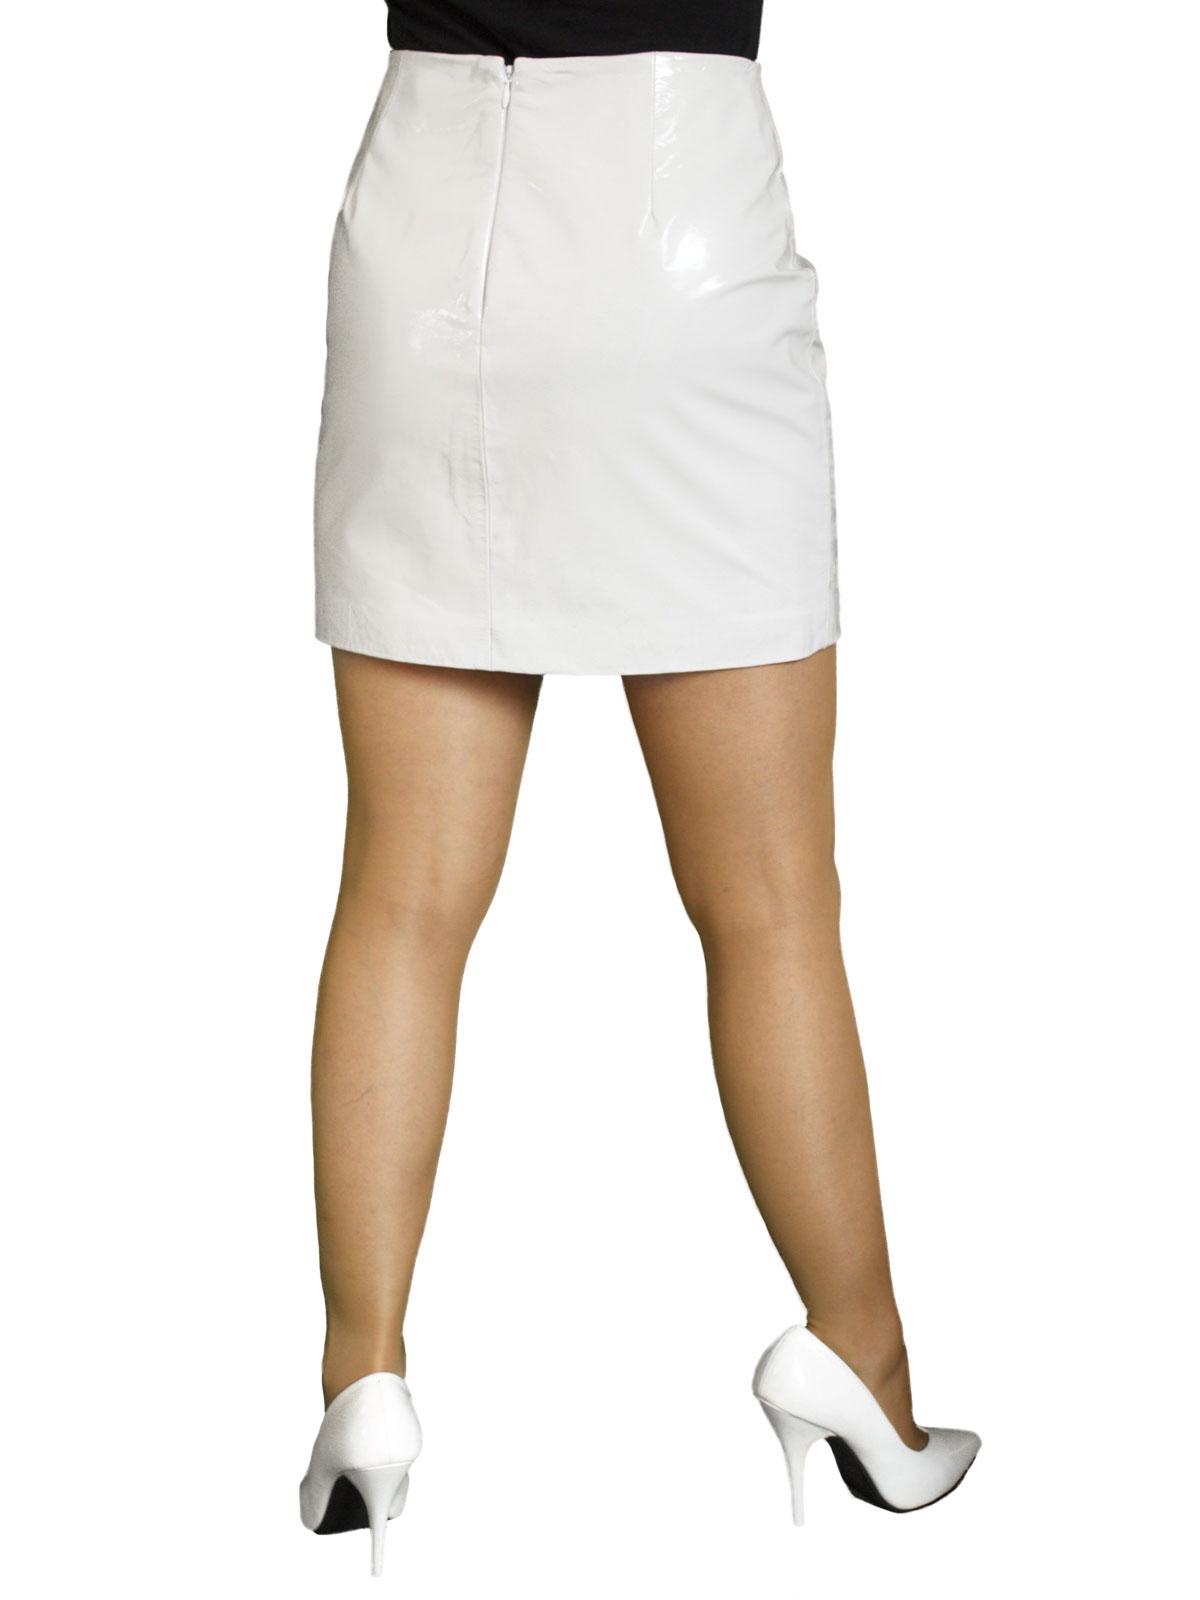 f973561fe5 Patent Leather Mini Skirt (Red or White) - Tout Ensemble